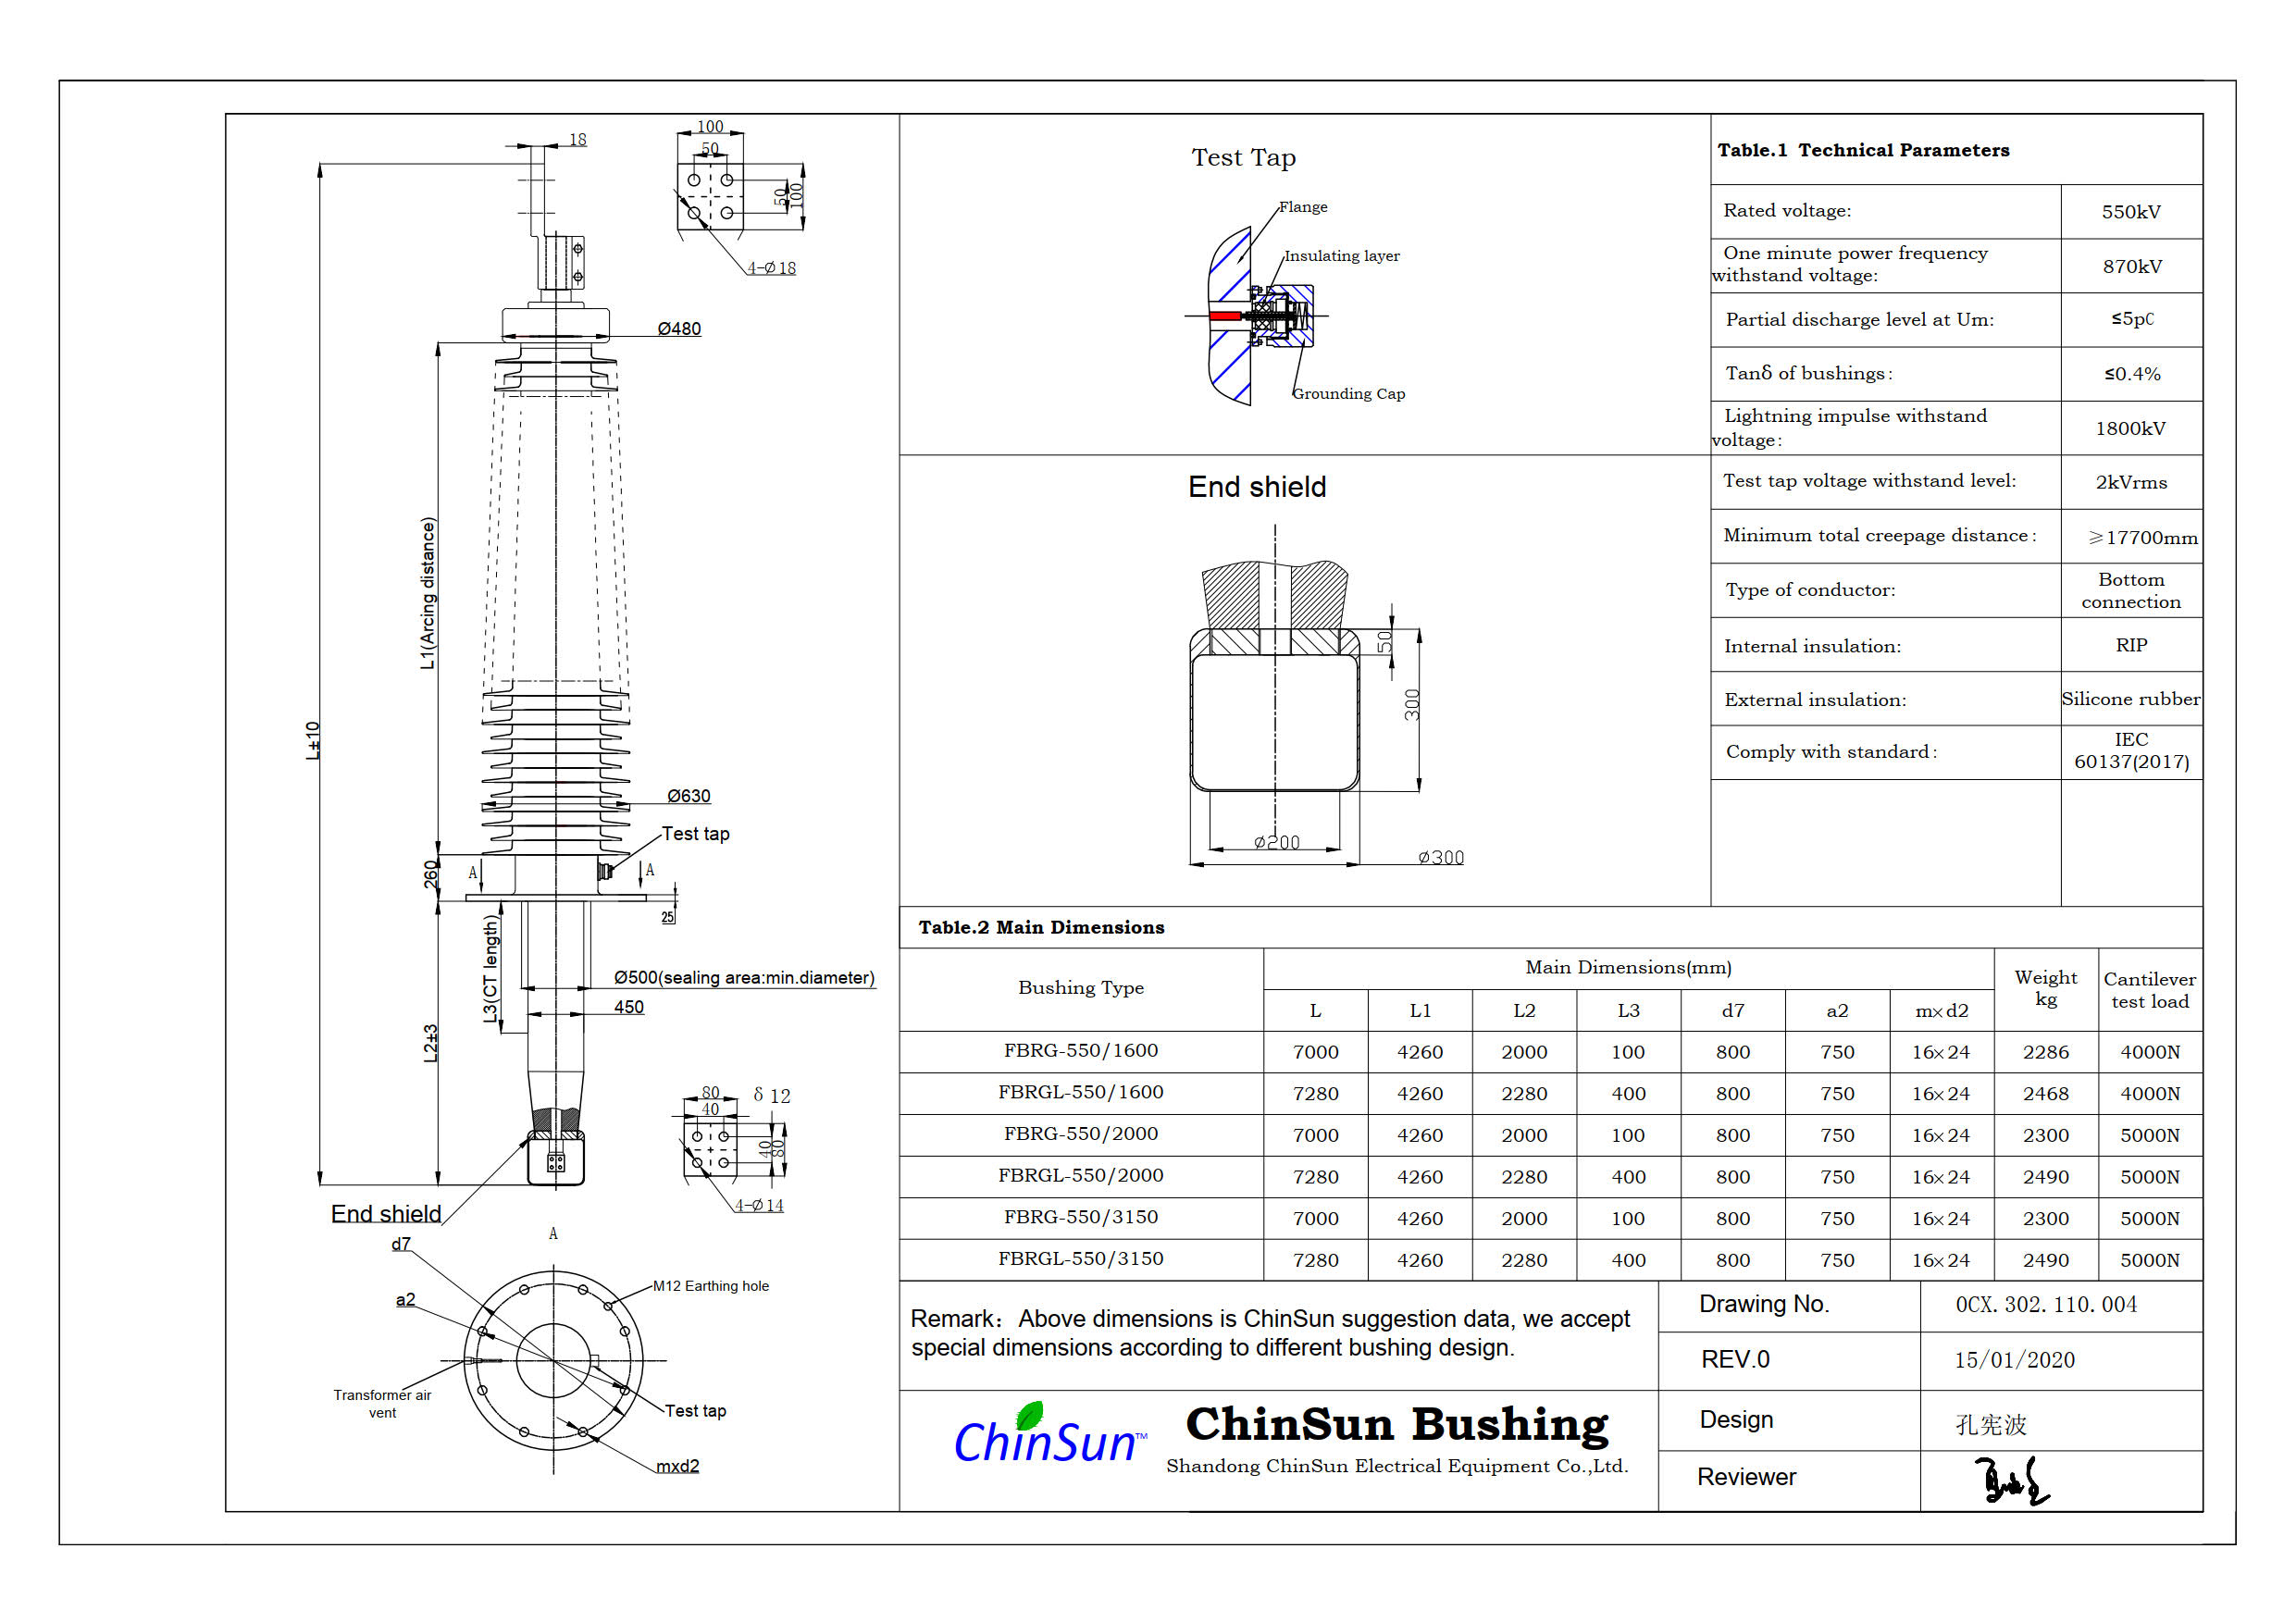 Drawing-transformer bushing-550kV silicone rubber-BC-ChinSun